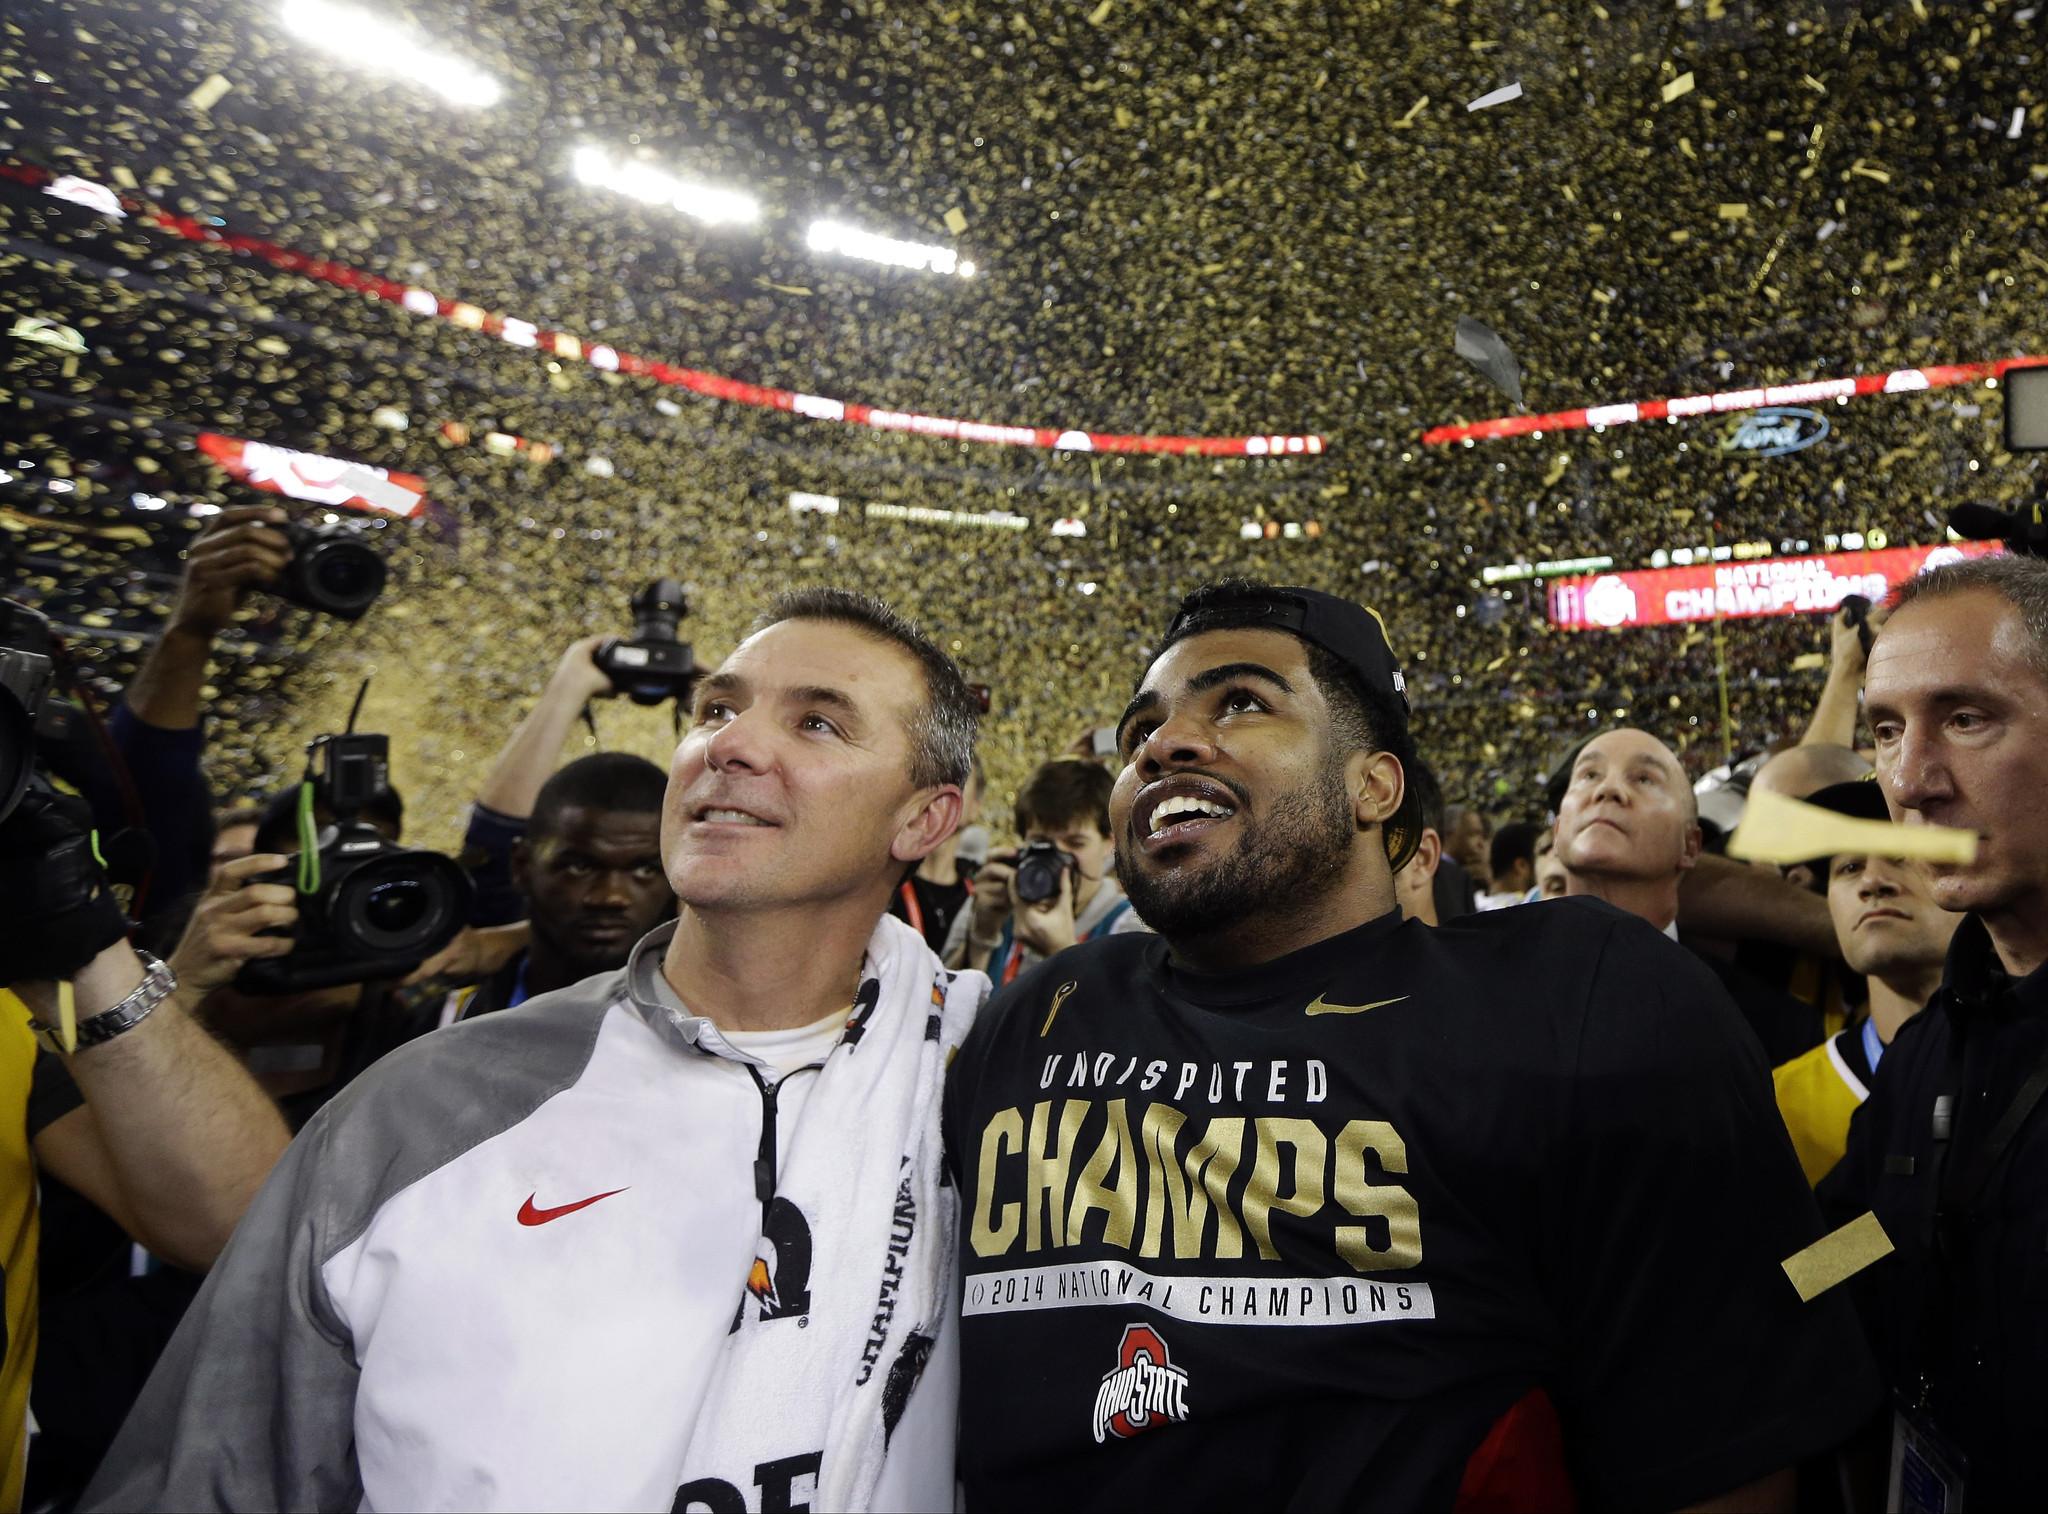 Ezekiel elliott ohio state beat oregon to win national - Ohio State Completes Remarkable Journey With National Championship Chicago Tribune